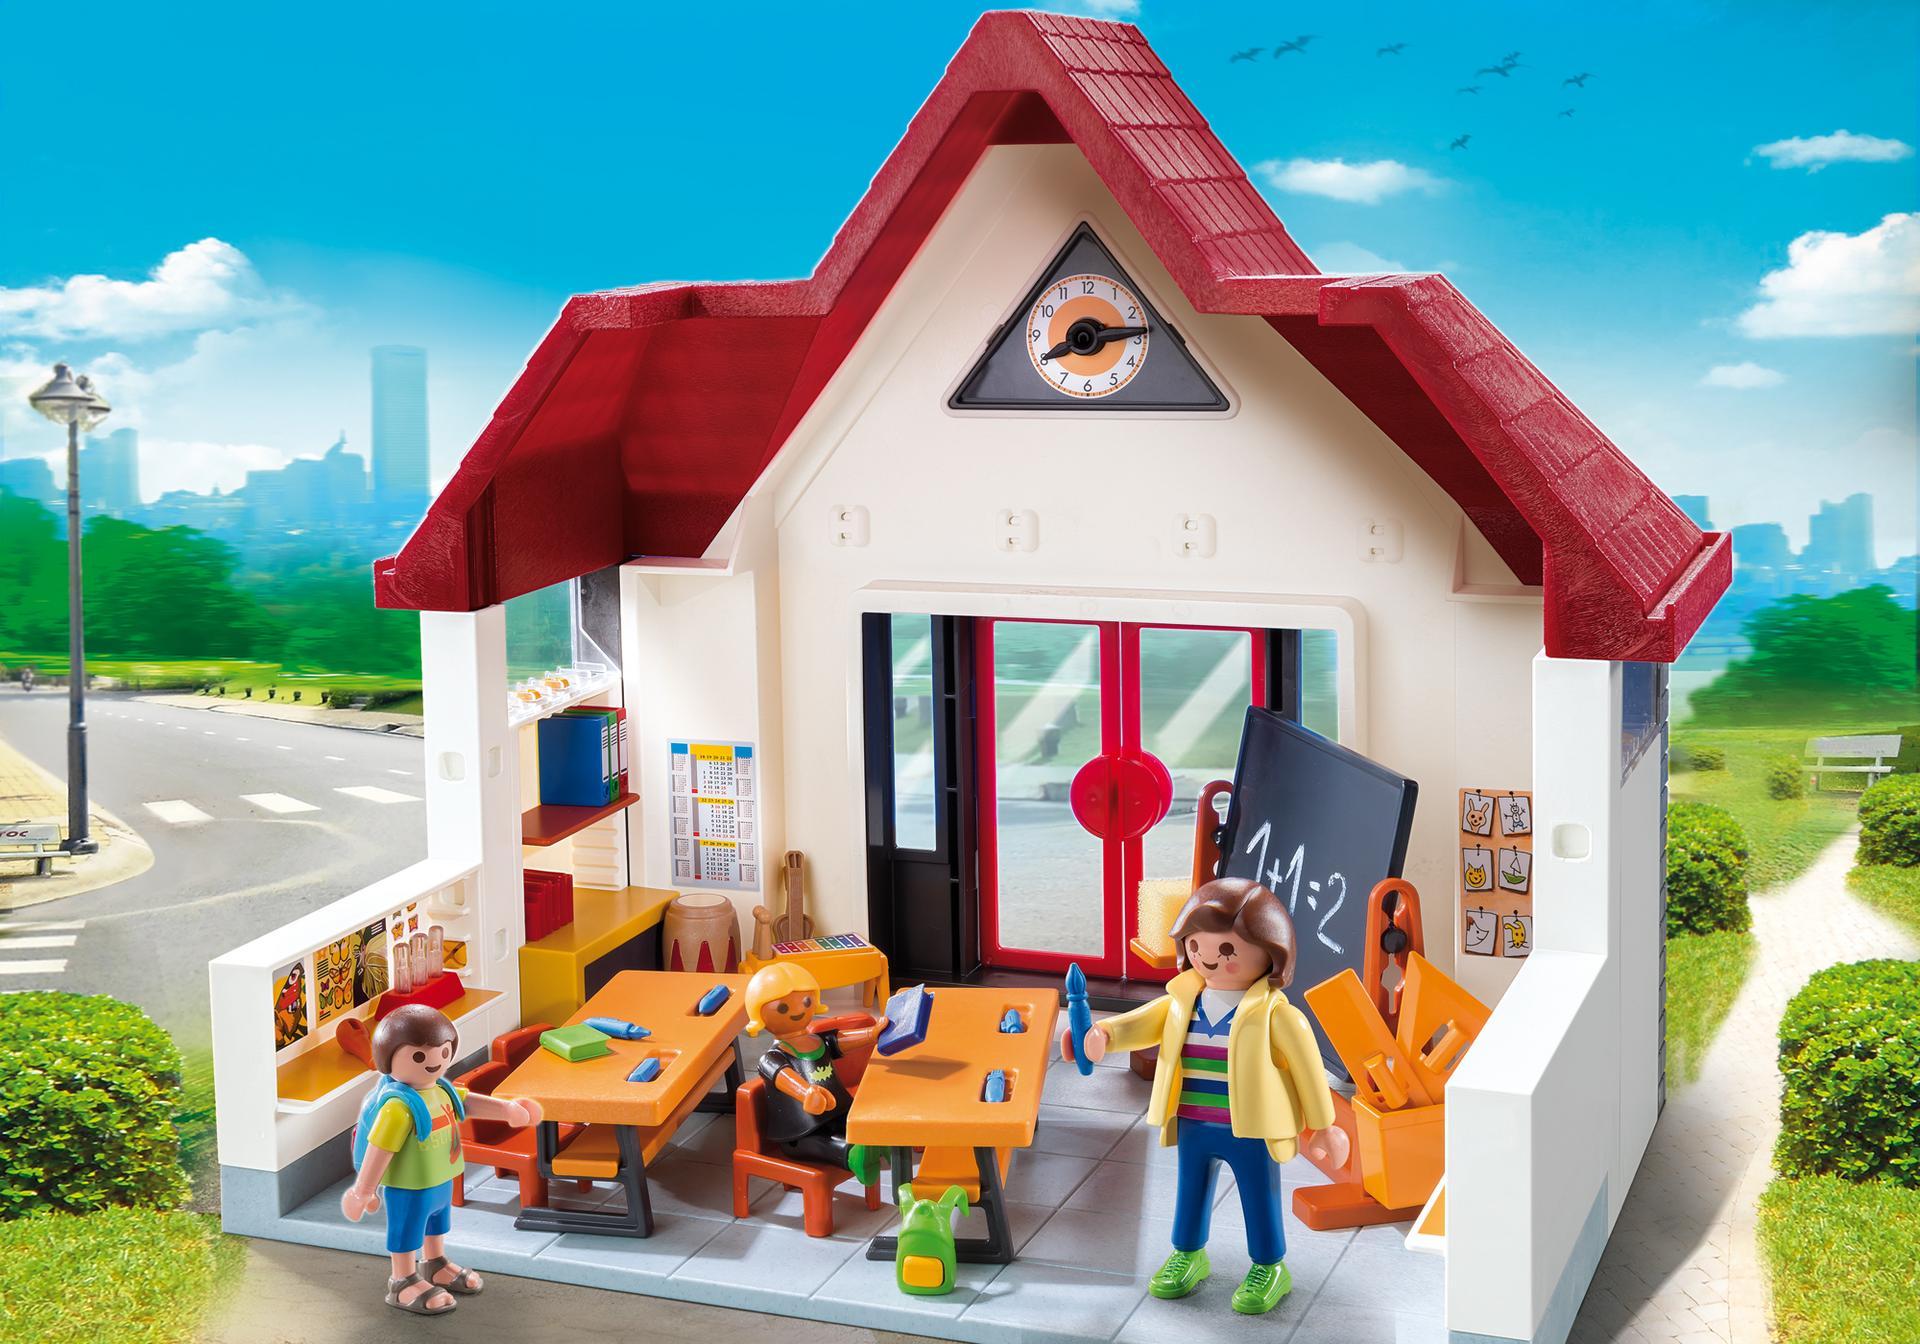 ecole avec salle de classe 6865 playmobil france. Black Bedroom Furniture Sets. Home Design Ideas